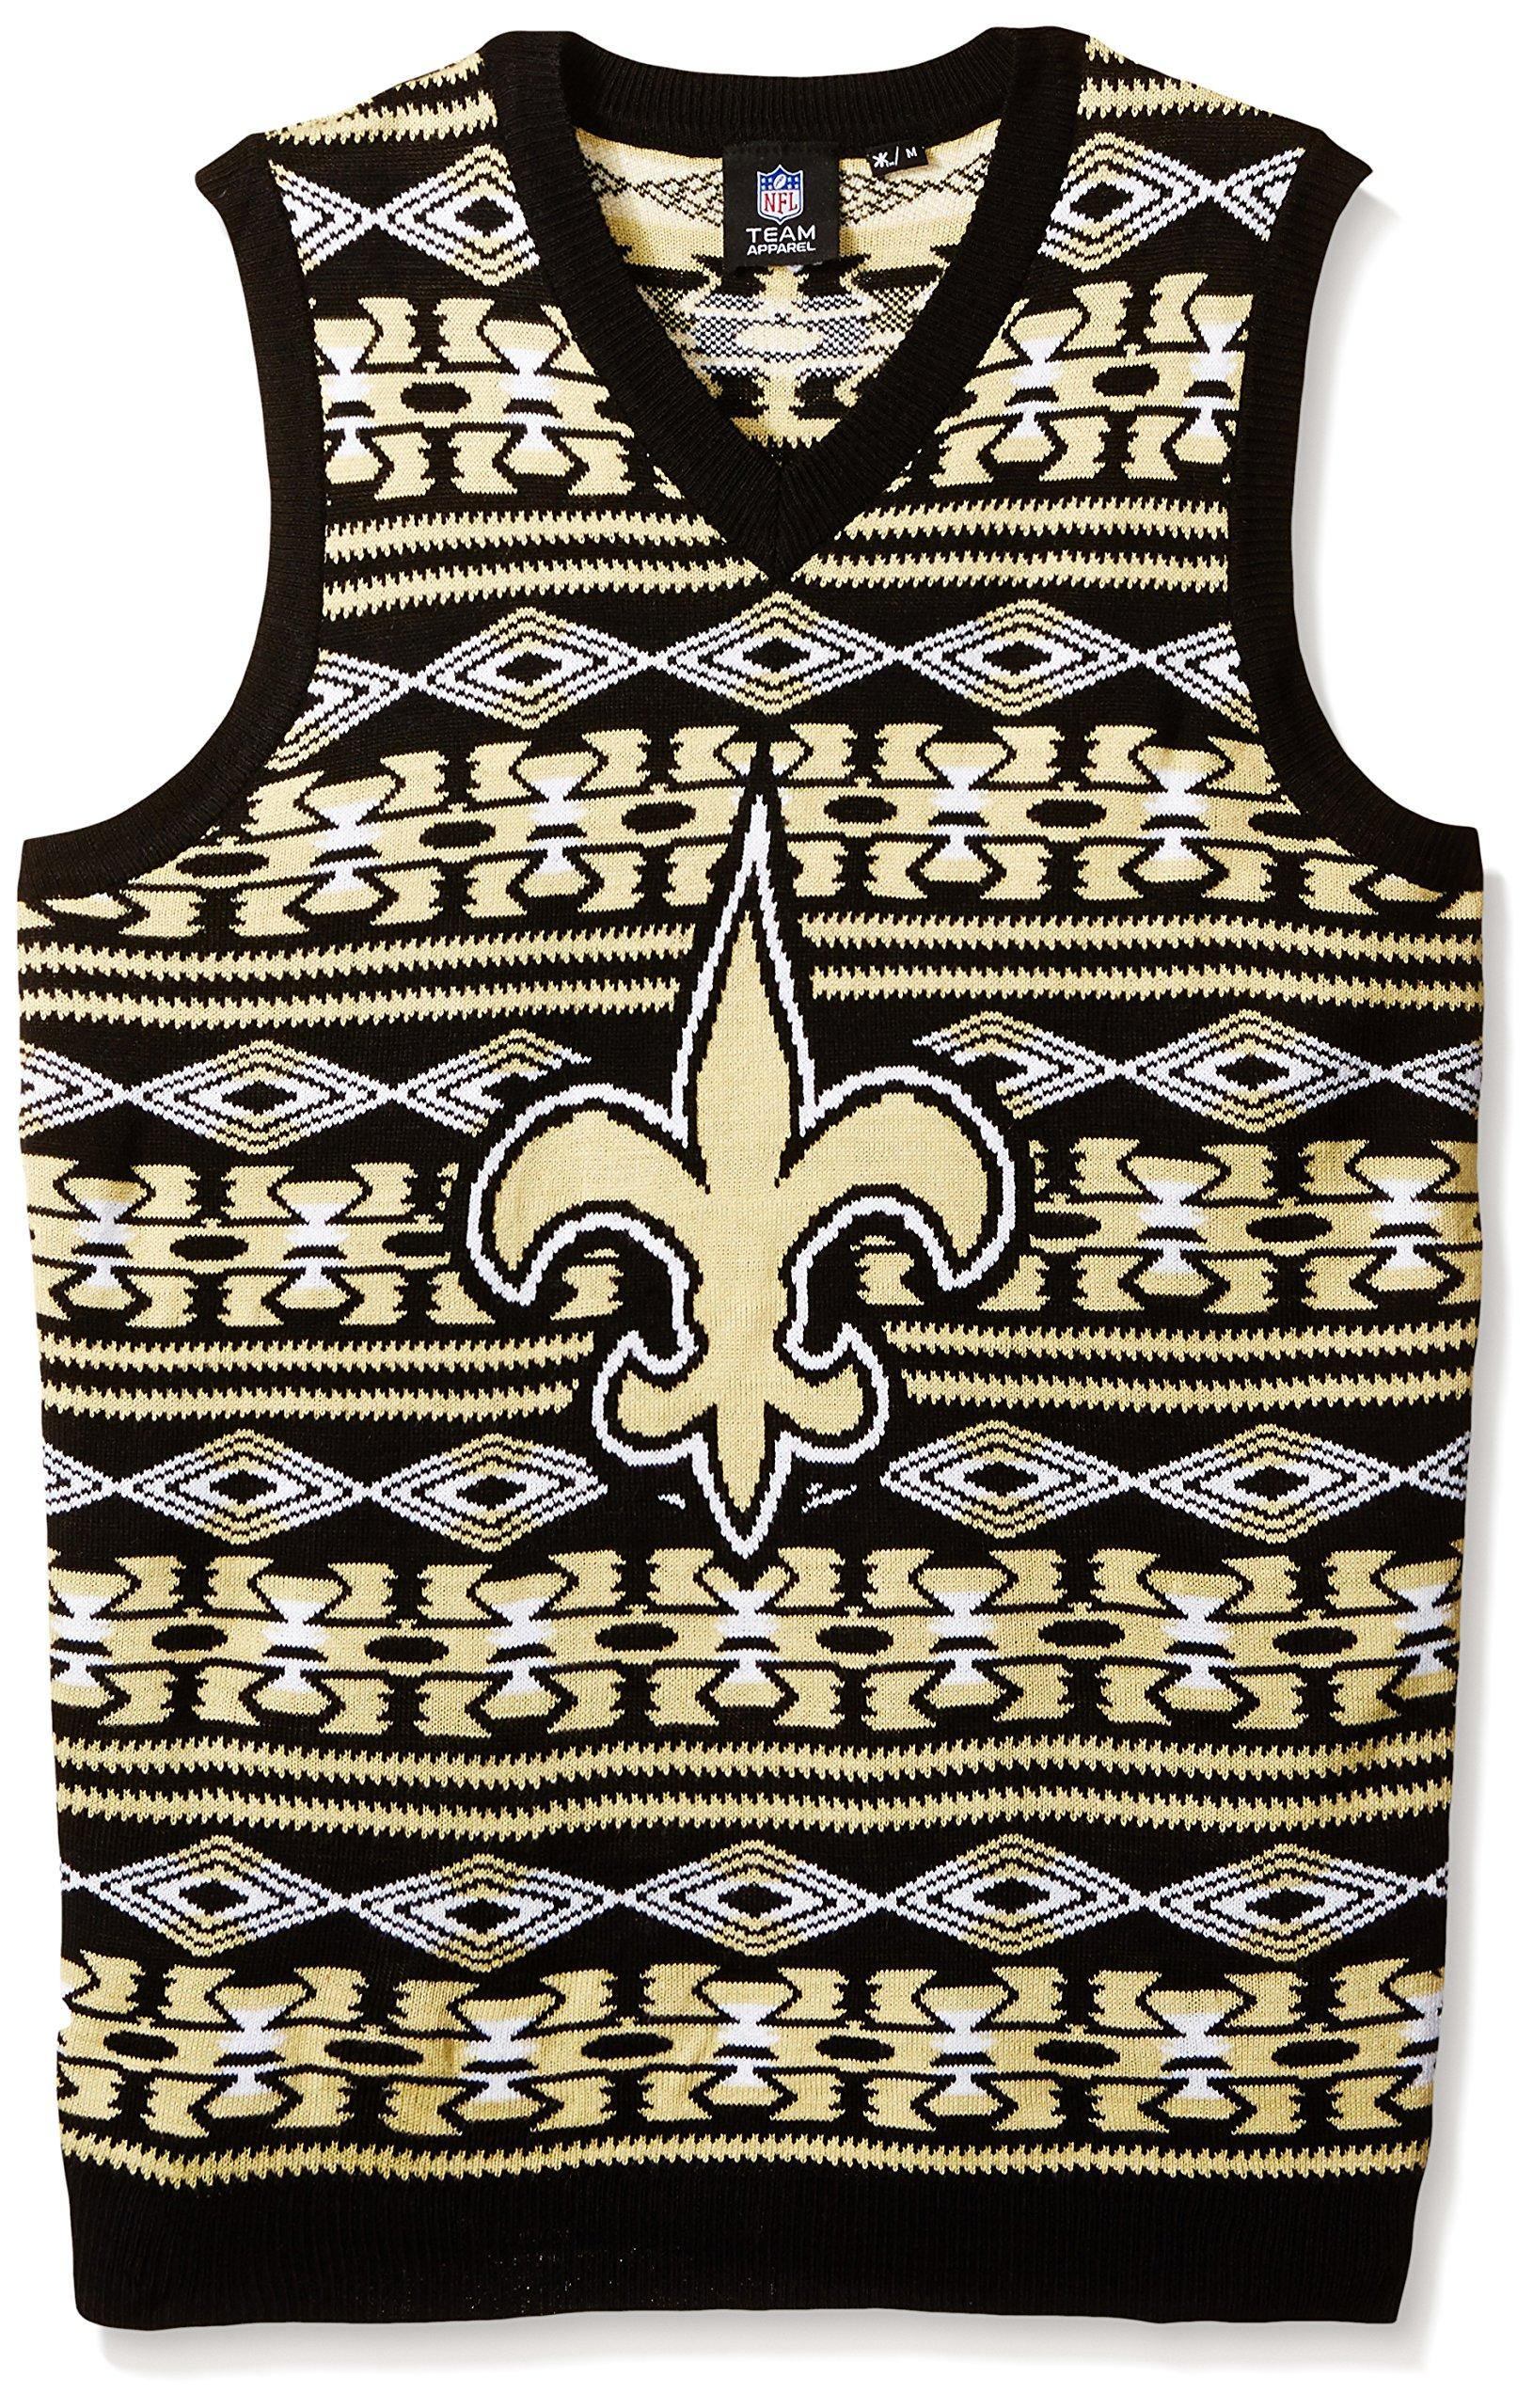 best service 7c71d 708a6 FOCO NFL San Diego Chargers Aztec Print Ugly Sweater Vest, XX-Large, Team  Color